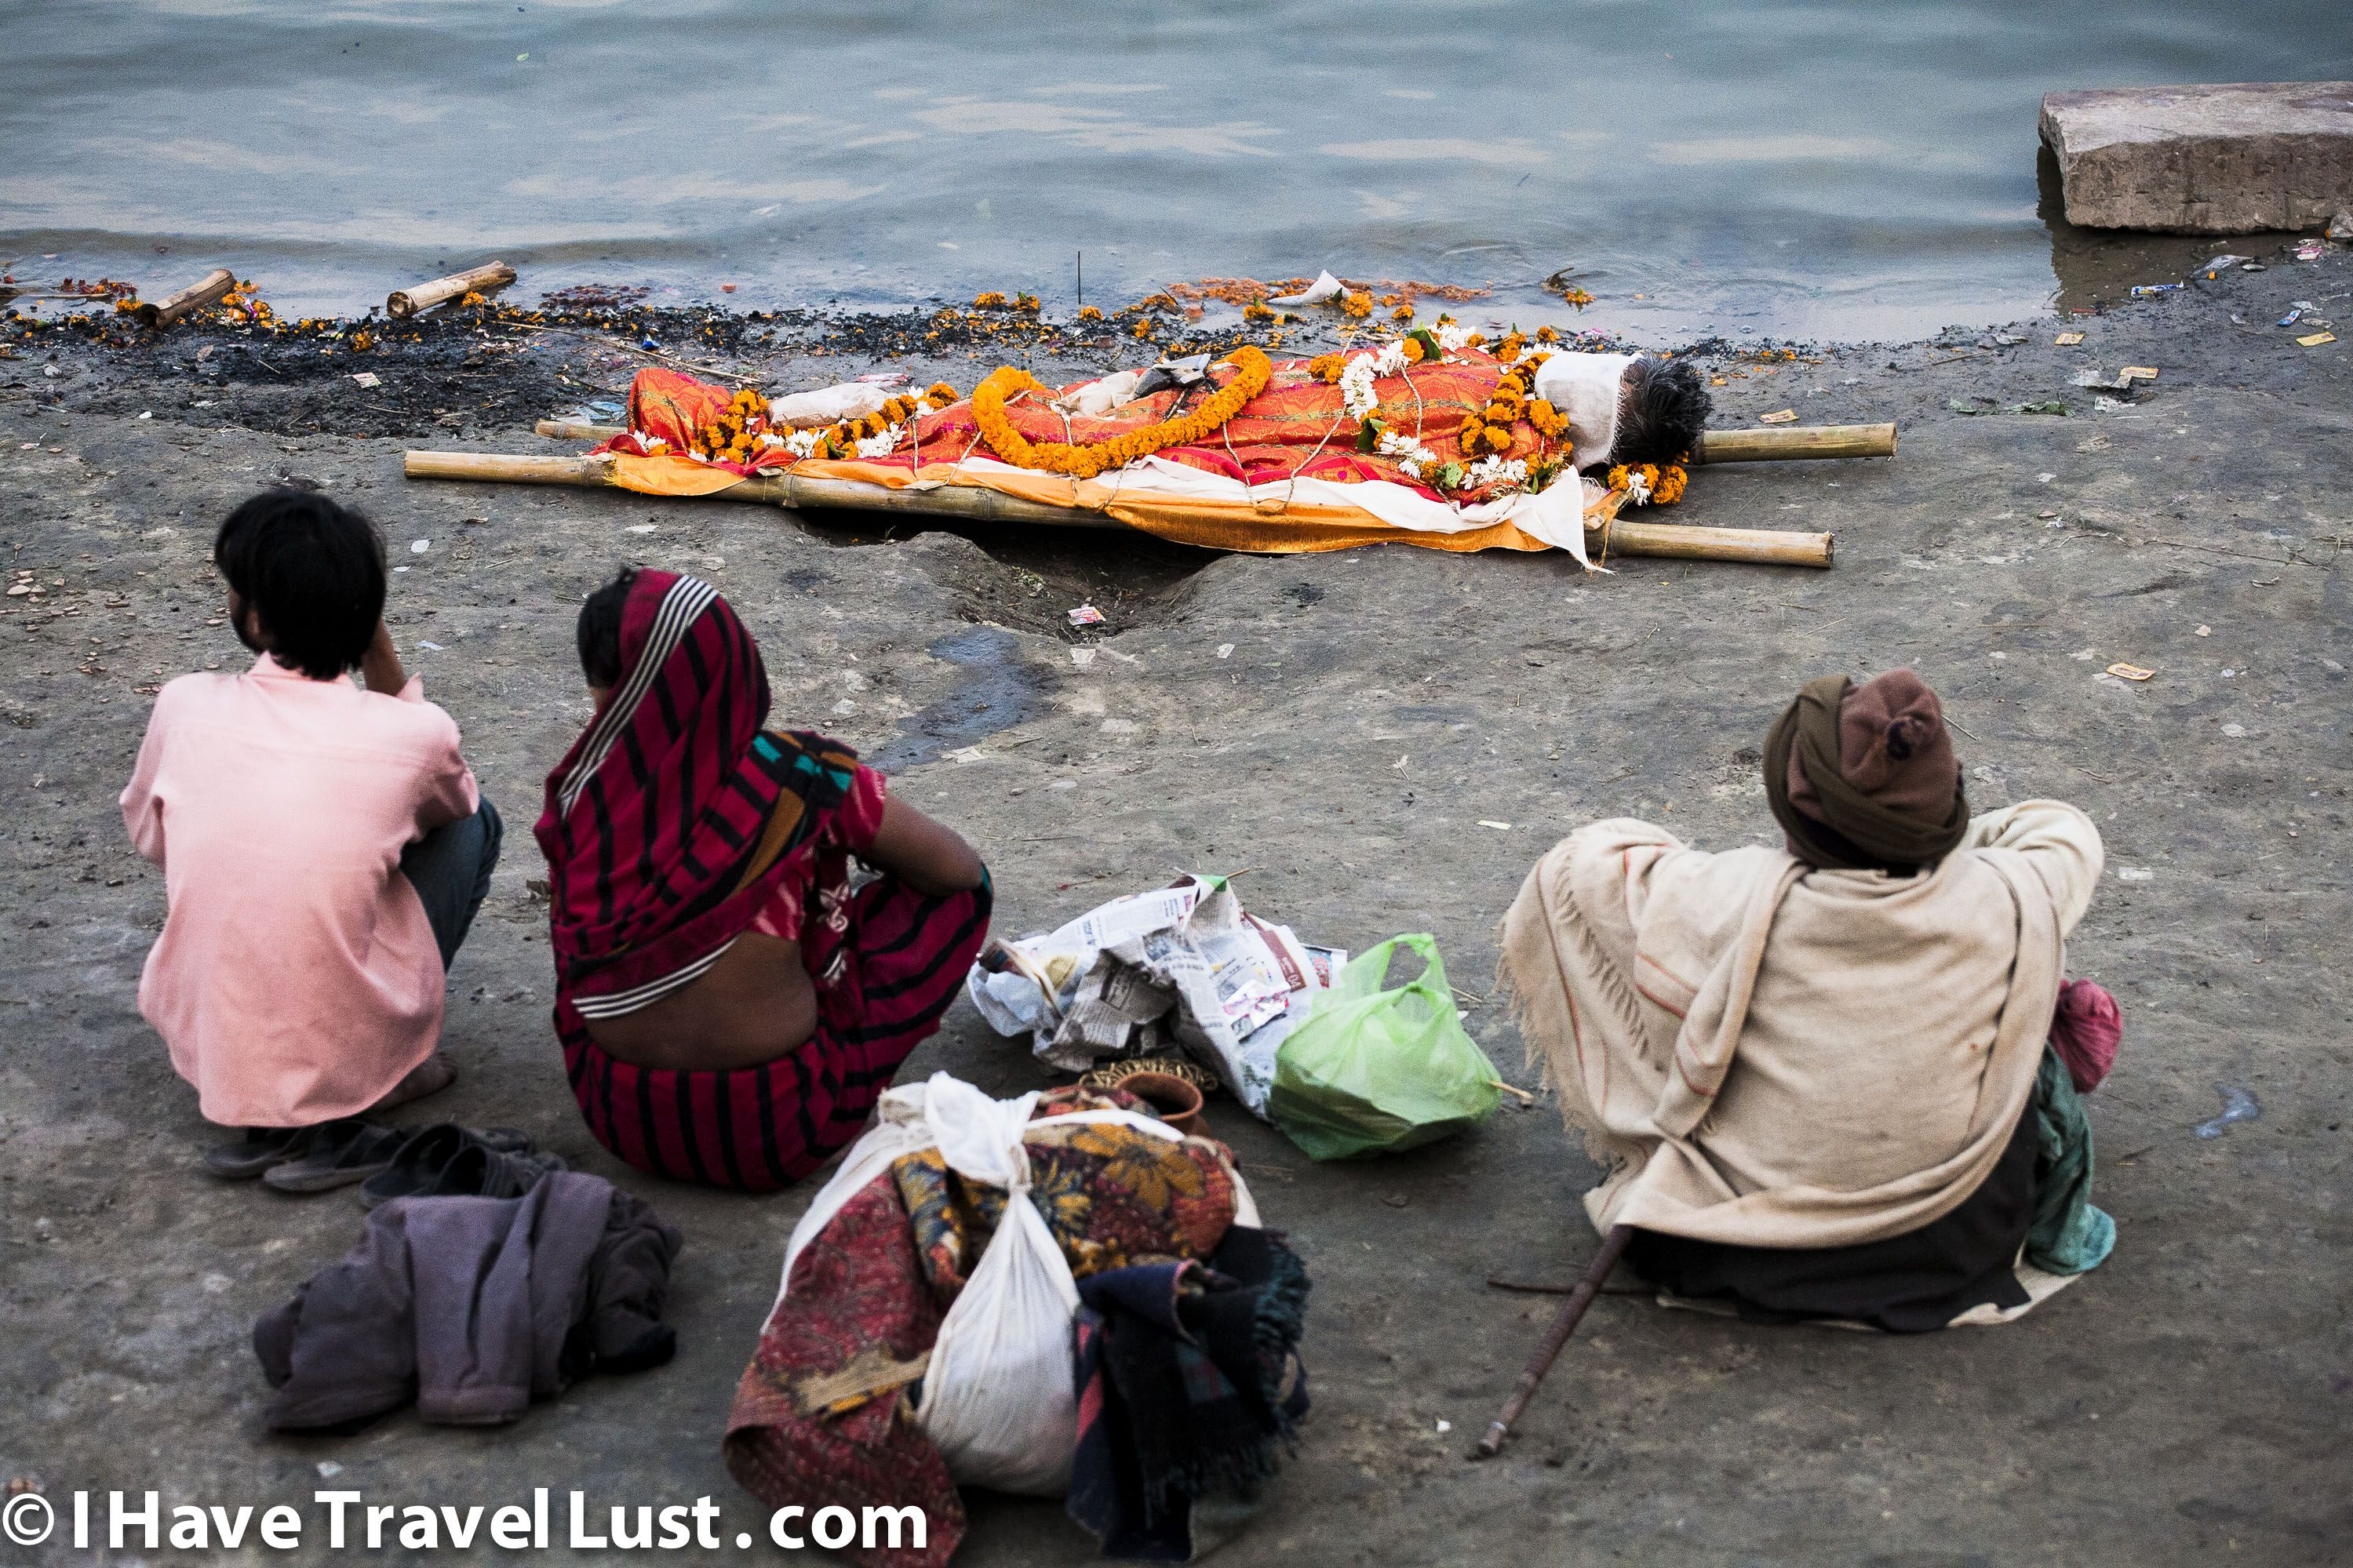 Varanasi Funeral India Https Ihavetravellust Files Wordpress Com